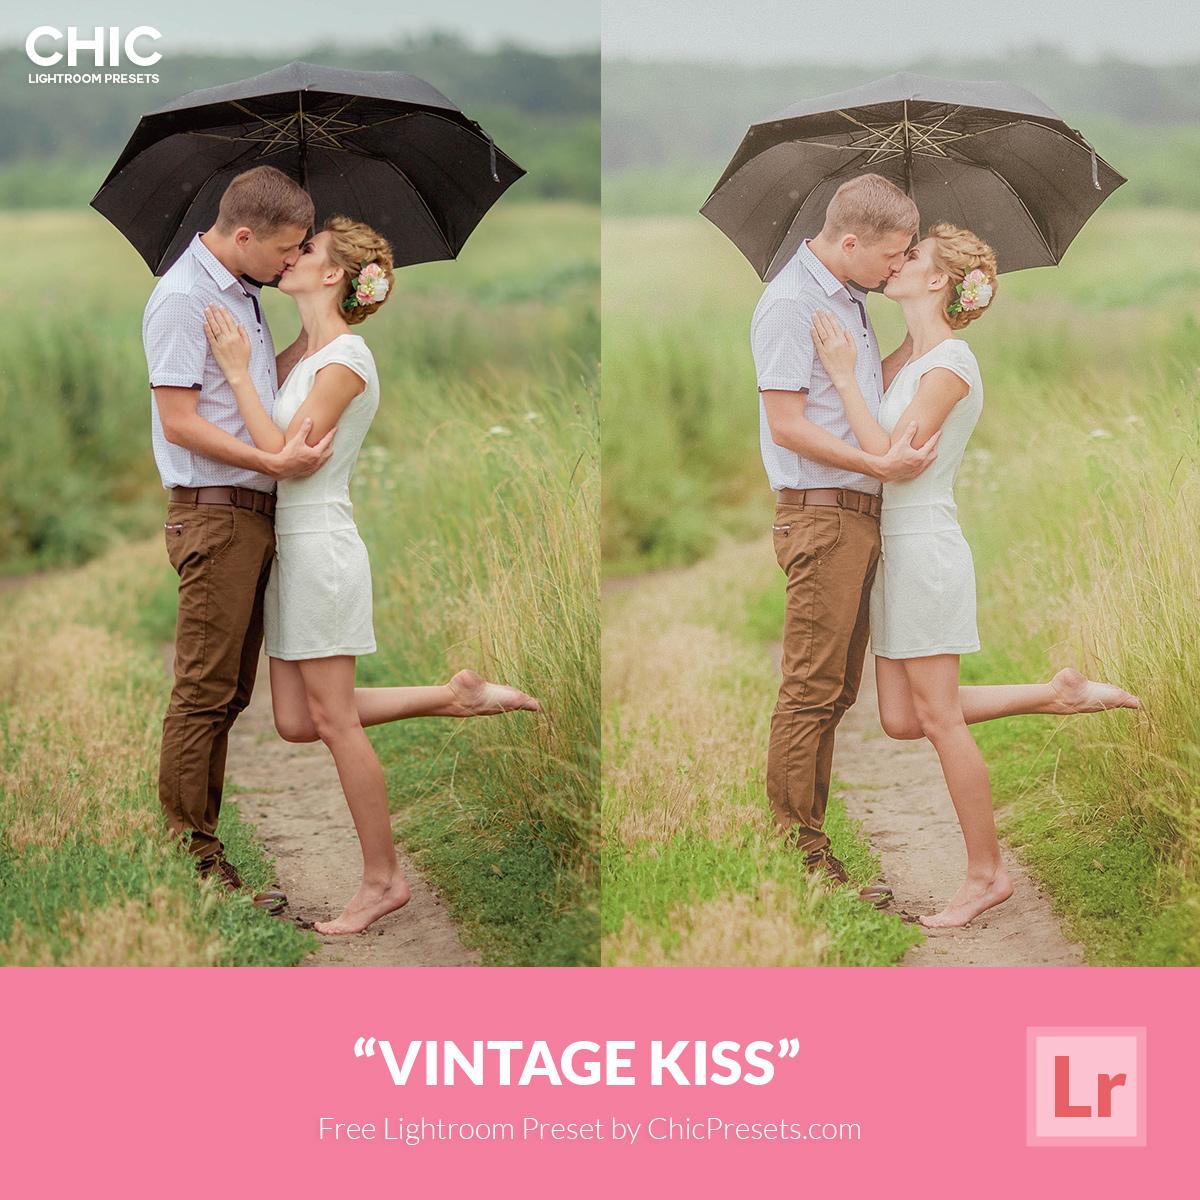 Vintage-Kiss-Chic